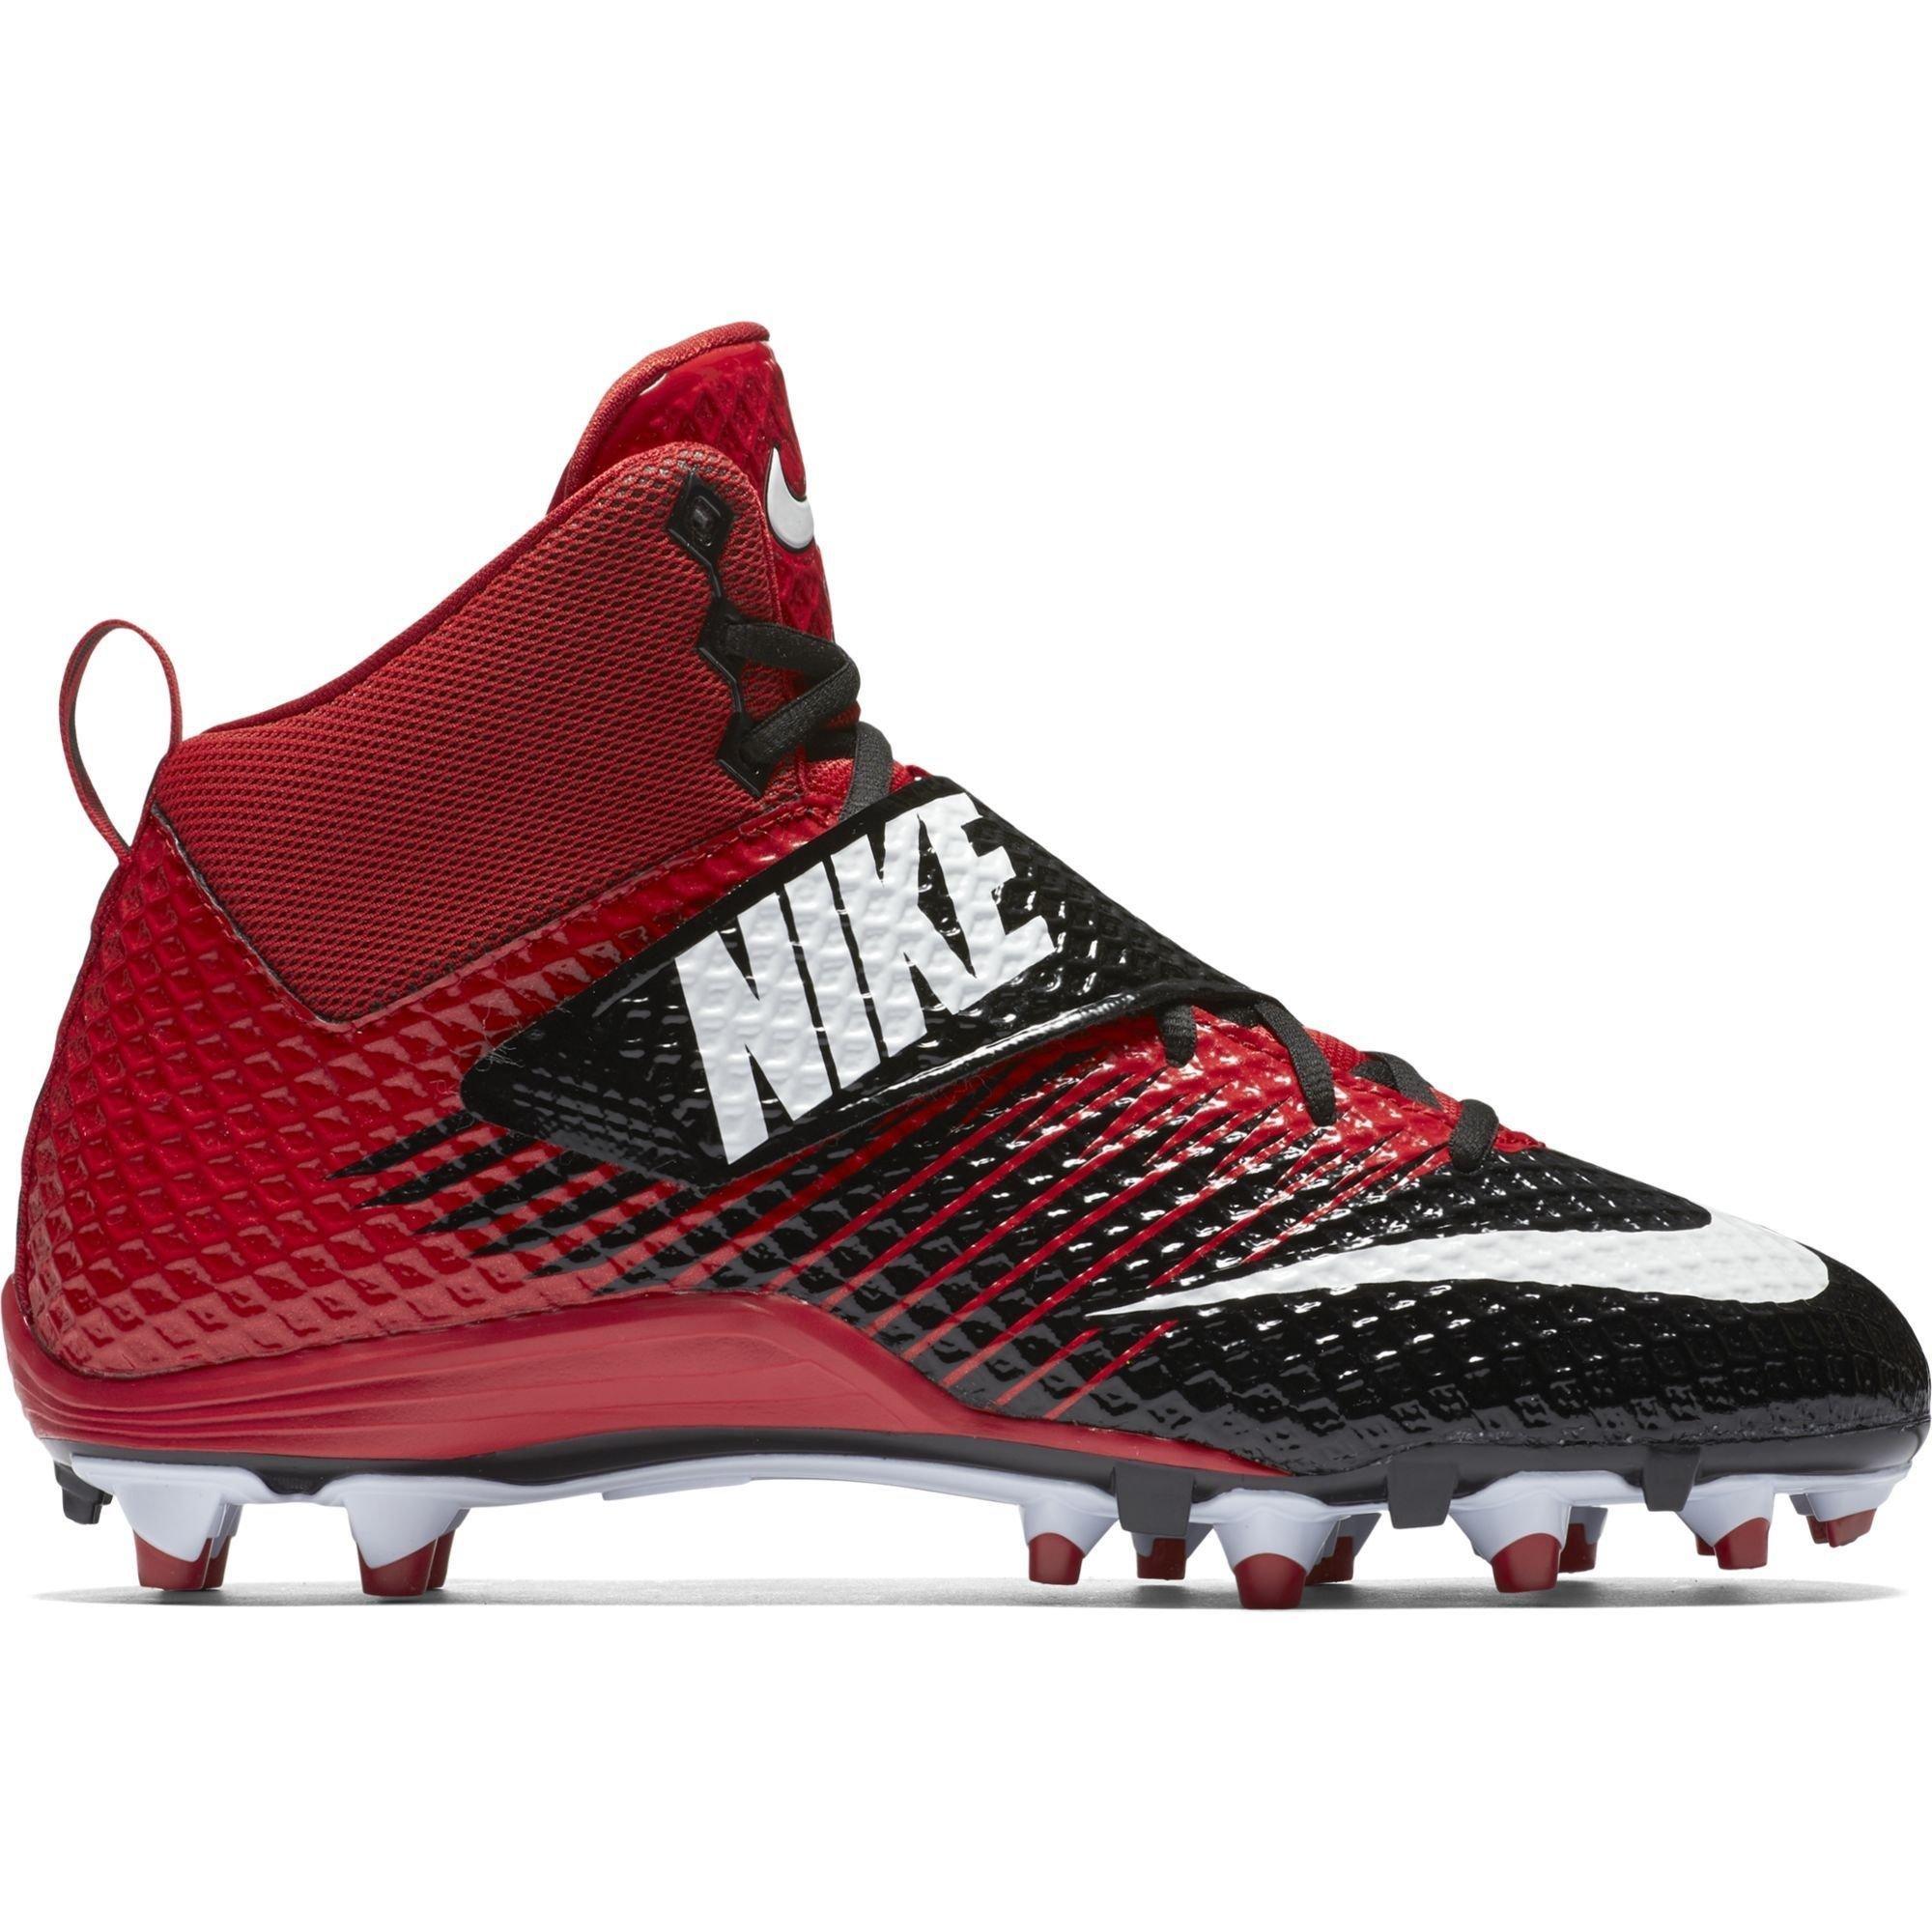 Nike Men's Lunarbeast Pro TD Football Cleat Black/University Red/White Size 10 M US